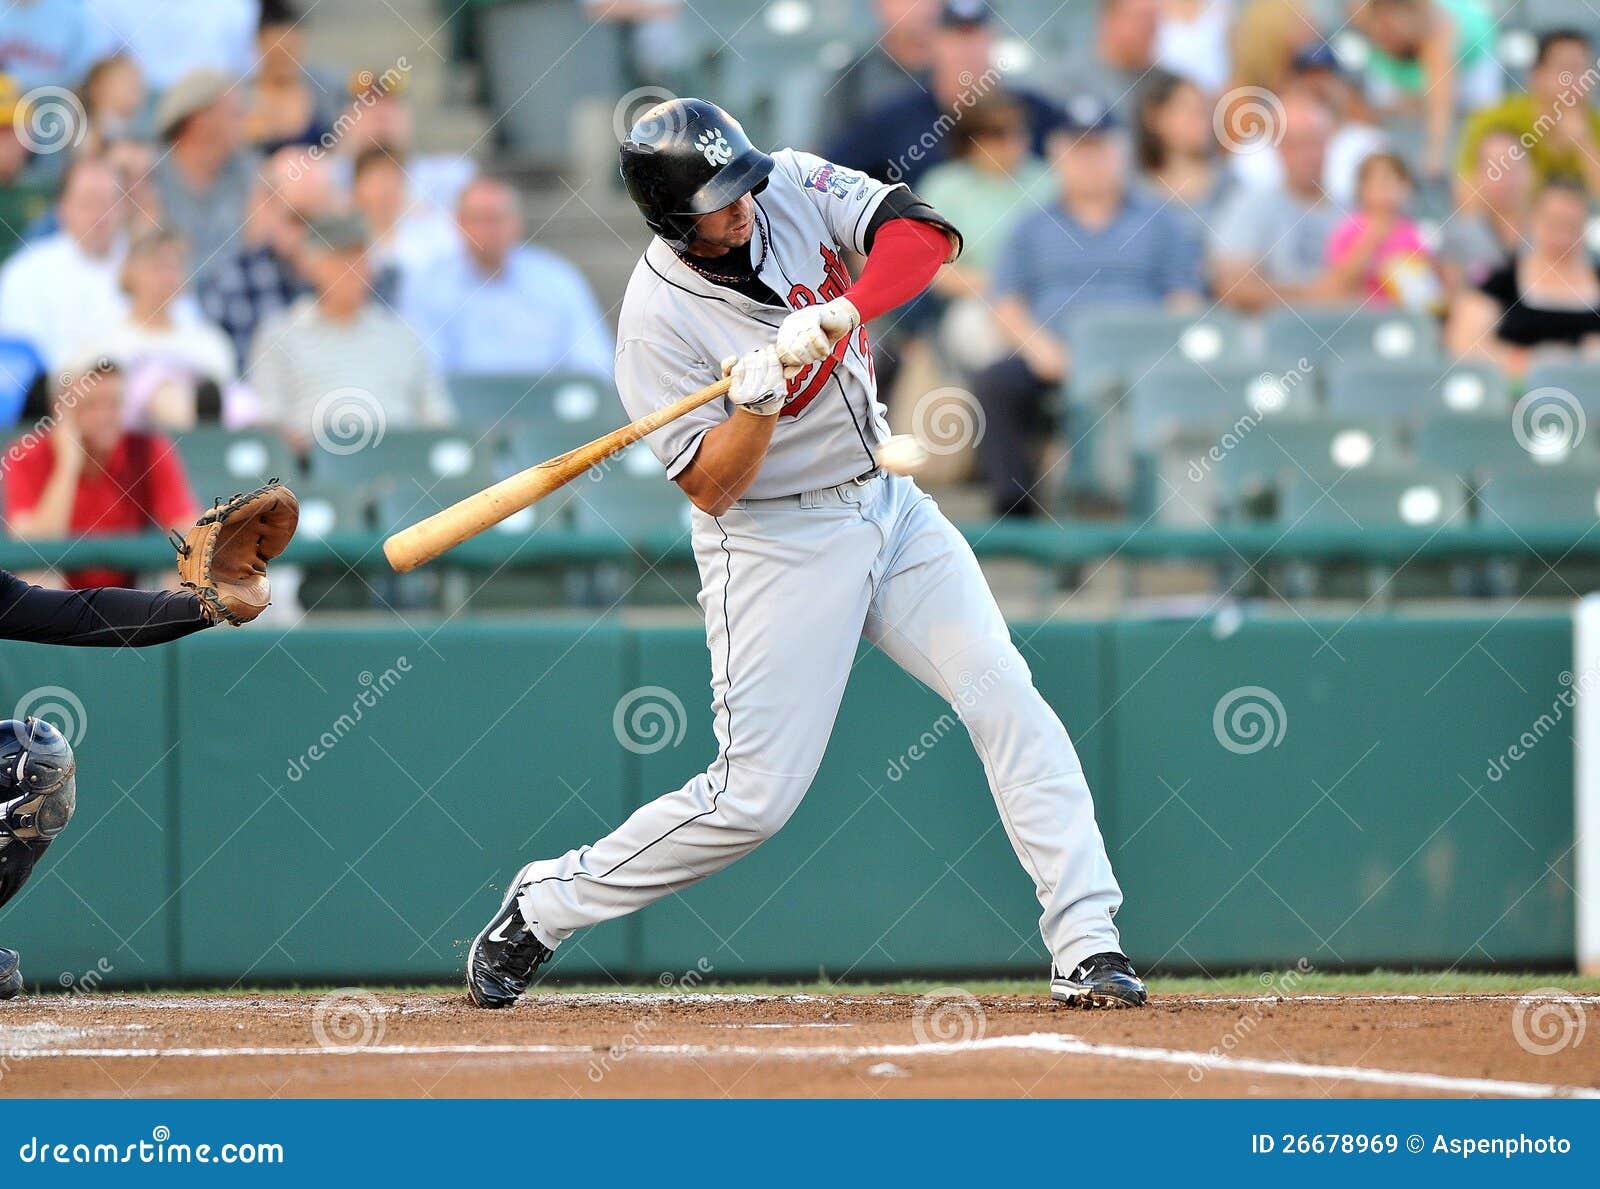 Baseball batters swinging